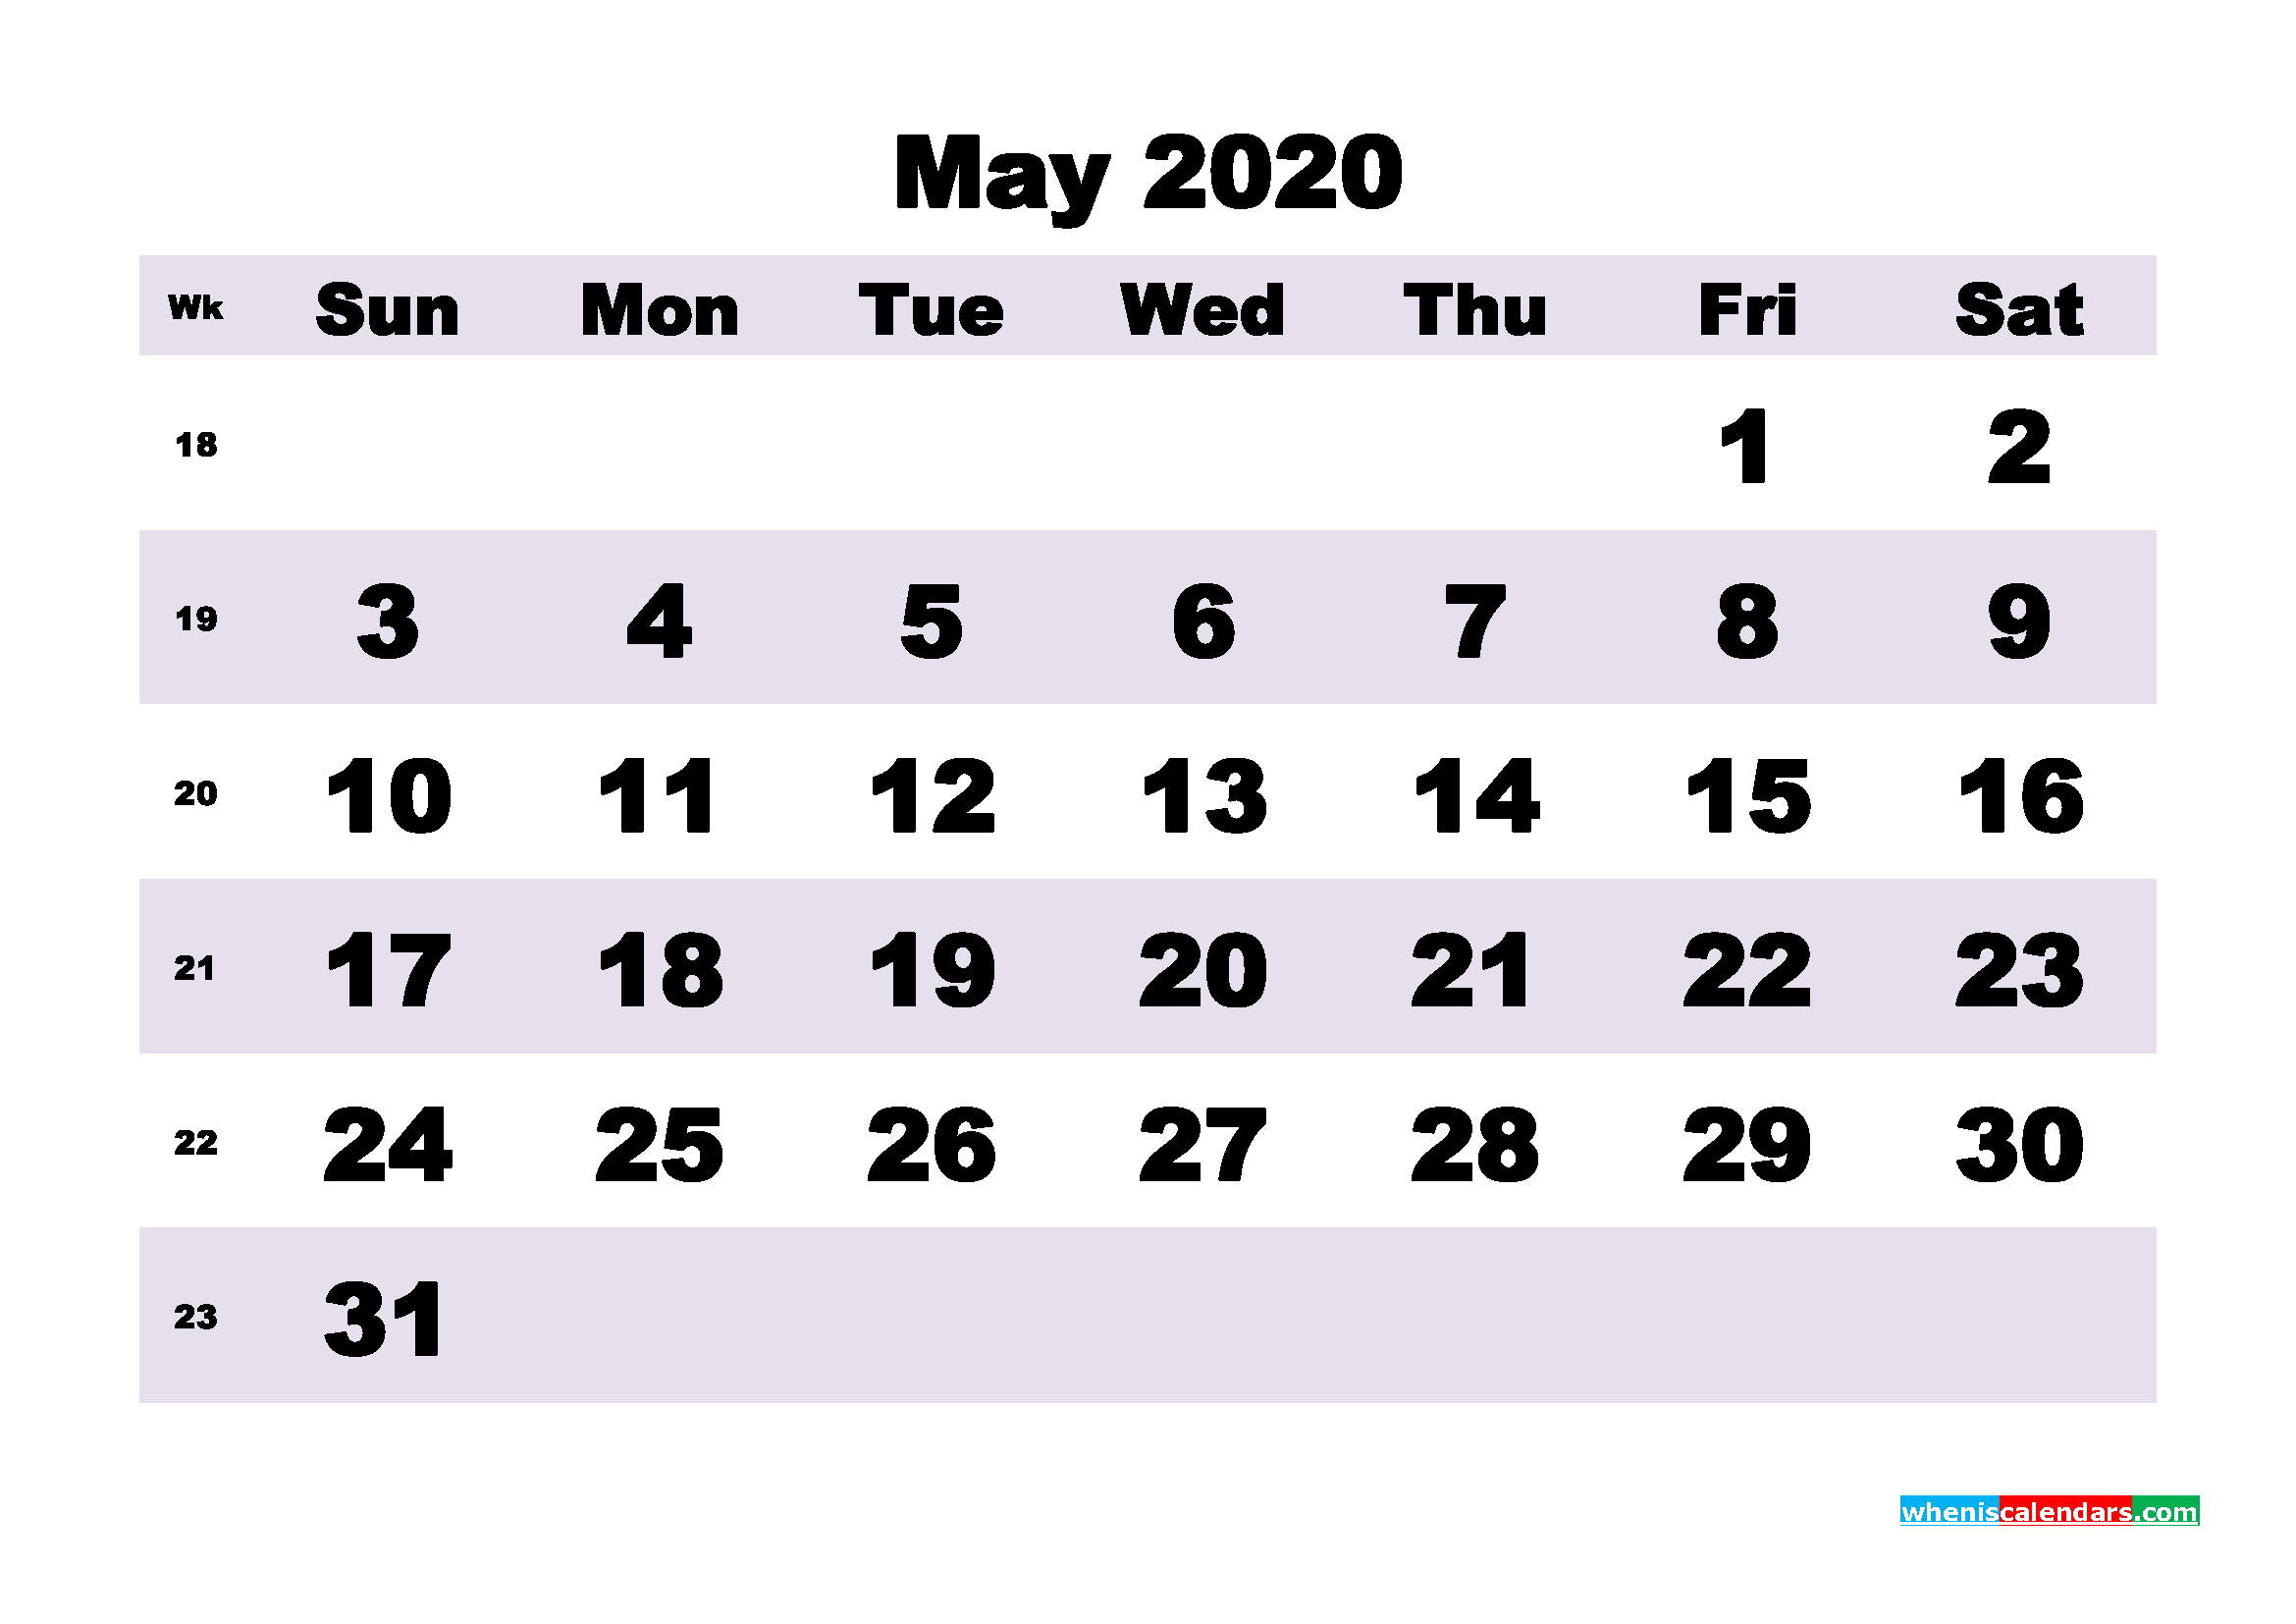 Blank May 2020 Calendar Printable - No.m20b197